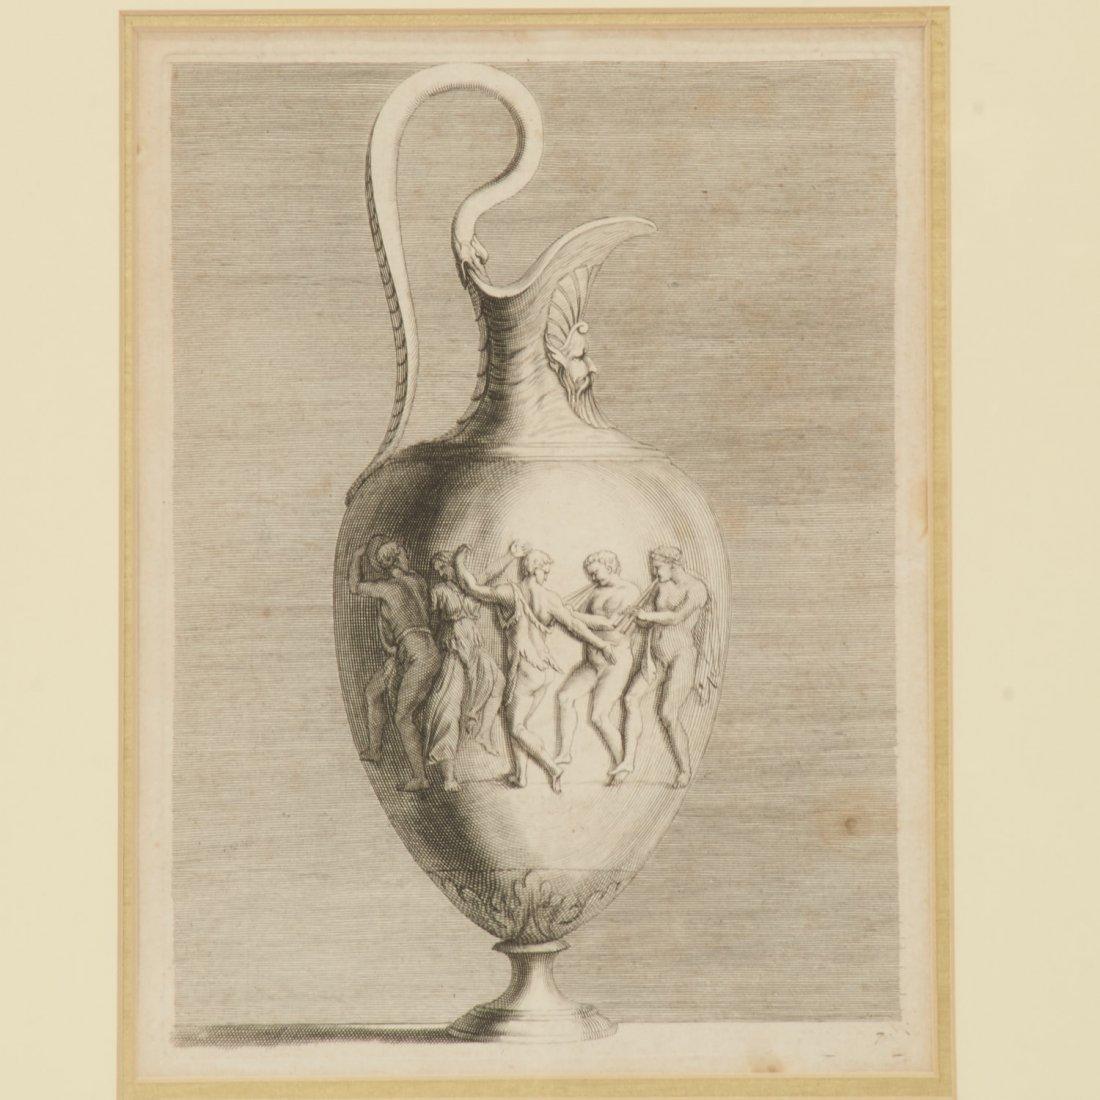 Pair Roman Antiquity engravings after Piranesi - 2